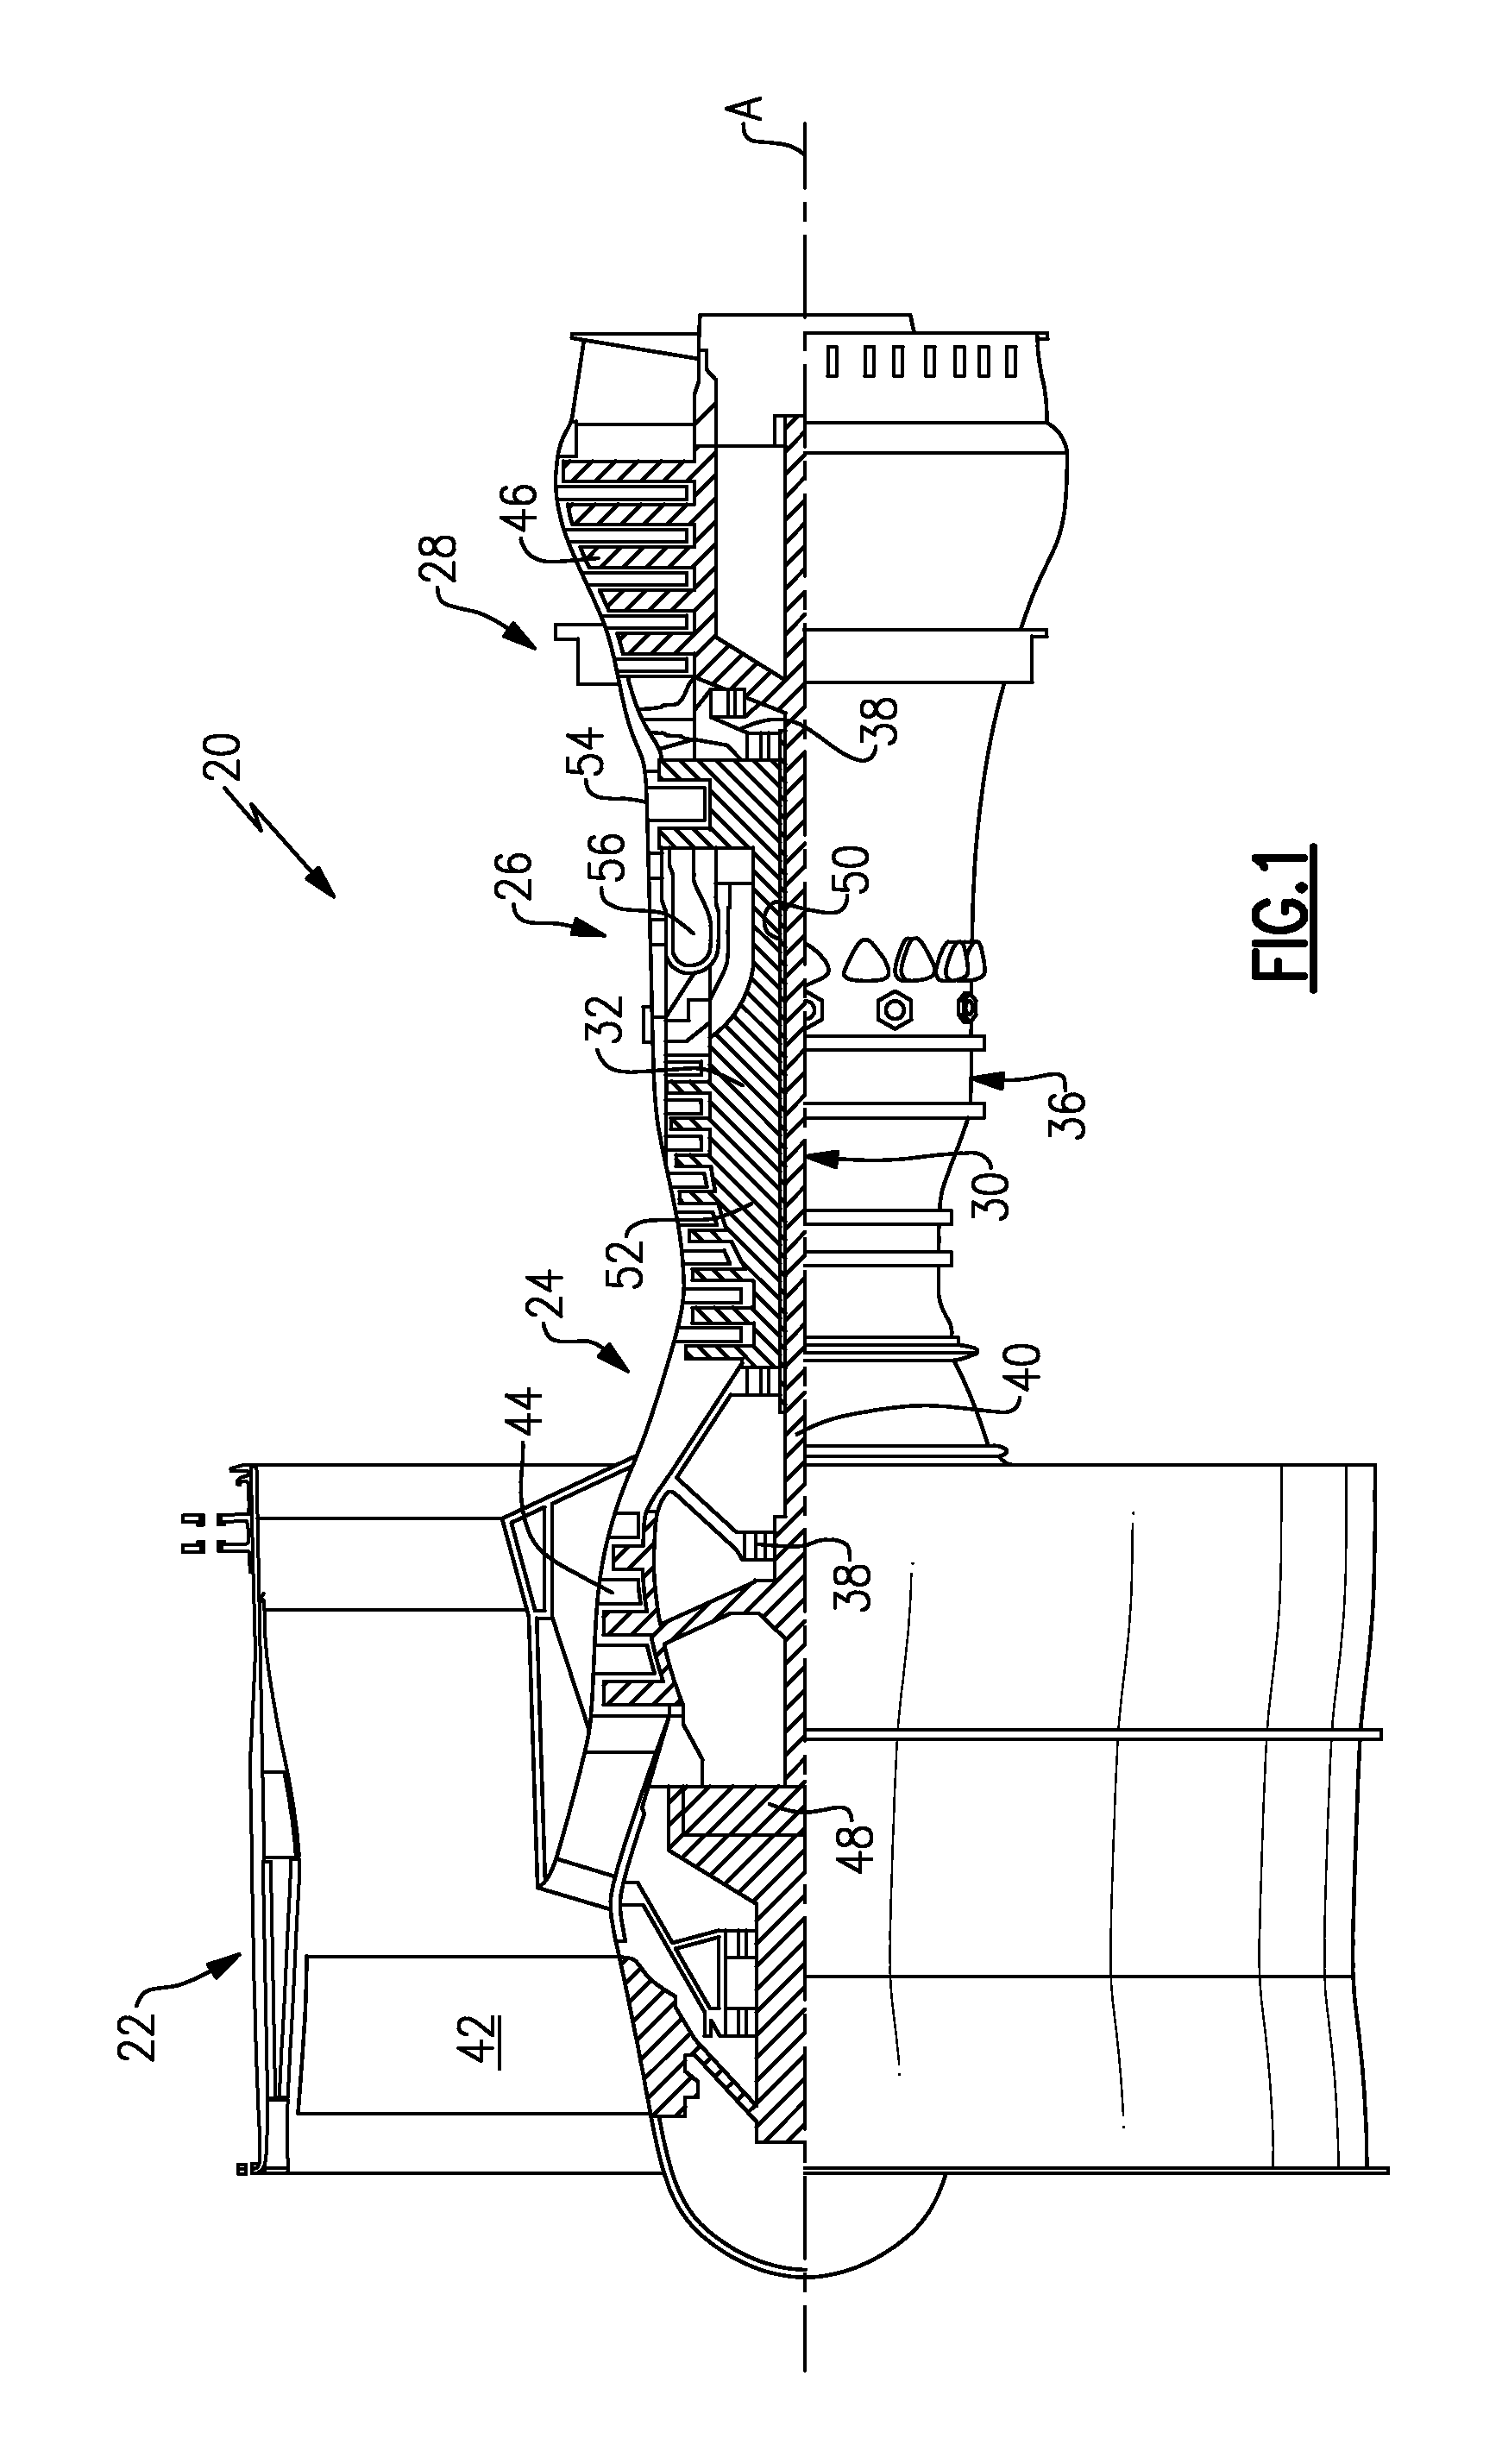 wiring diagram 2006 hyundai azera